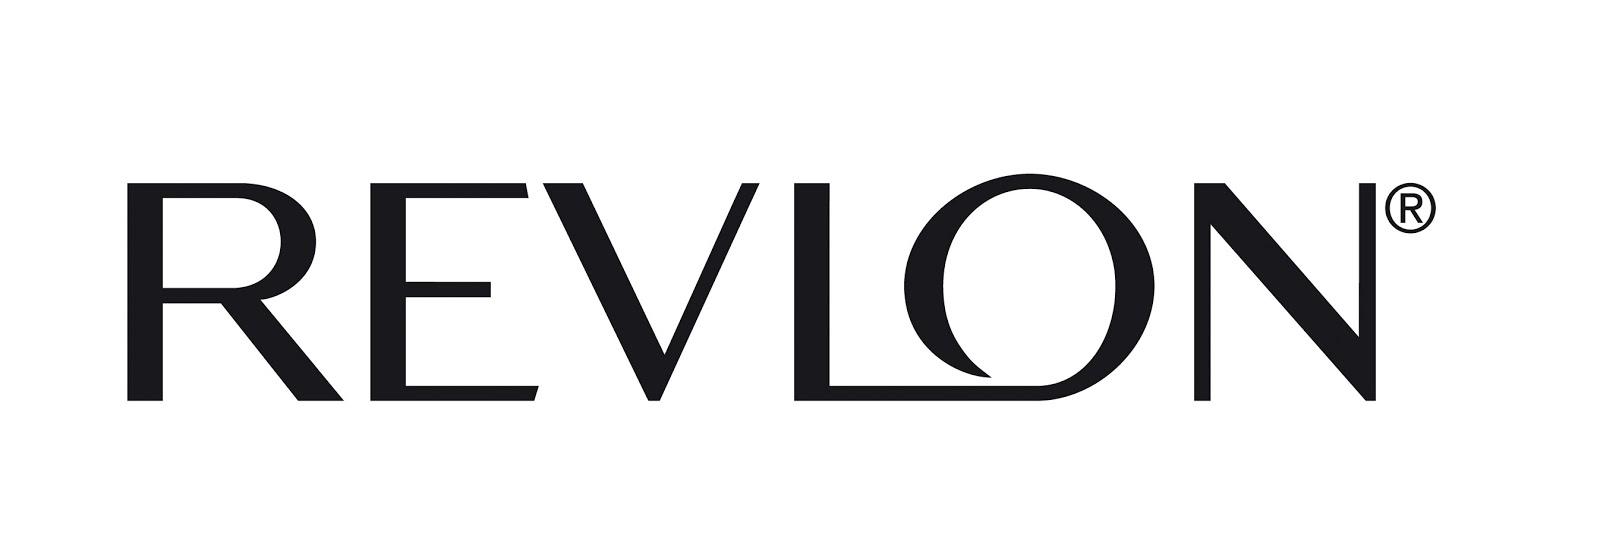 Revlon Logo